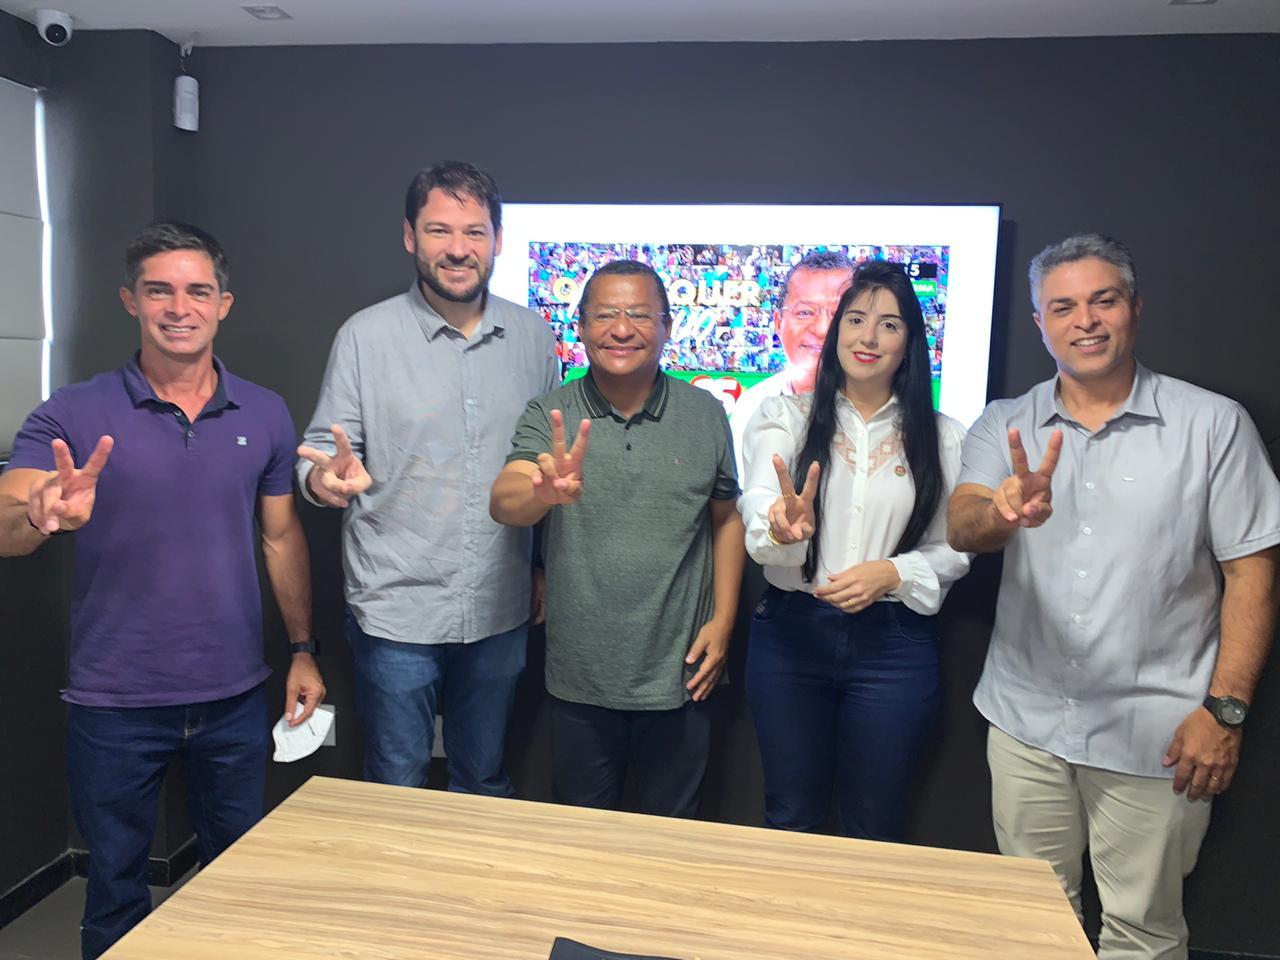 WhatsApp Image 2020 11 24 at 16.33.57 - Candidatos a vice de Walber, Raoni e Ruy Carneiro estão apoiando Nilvan neste segundo turno